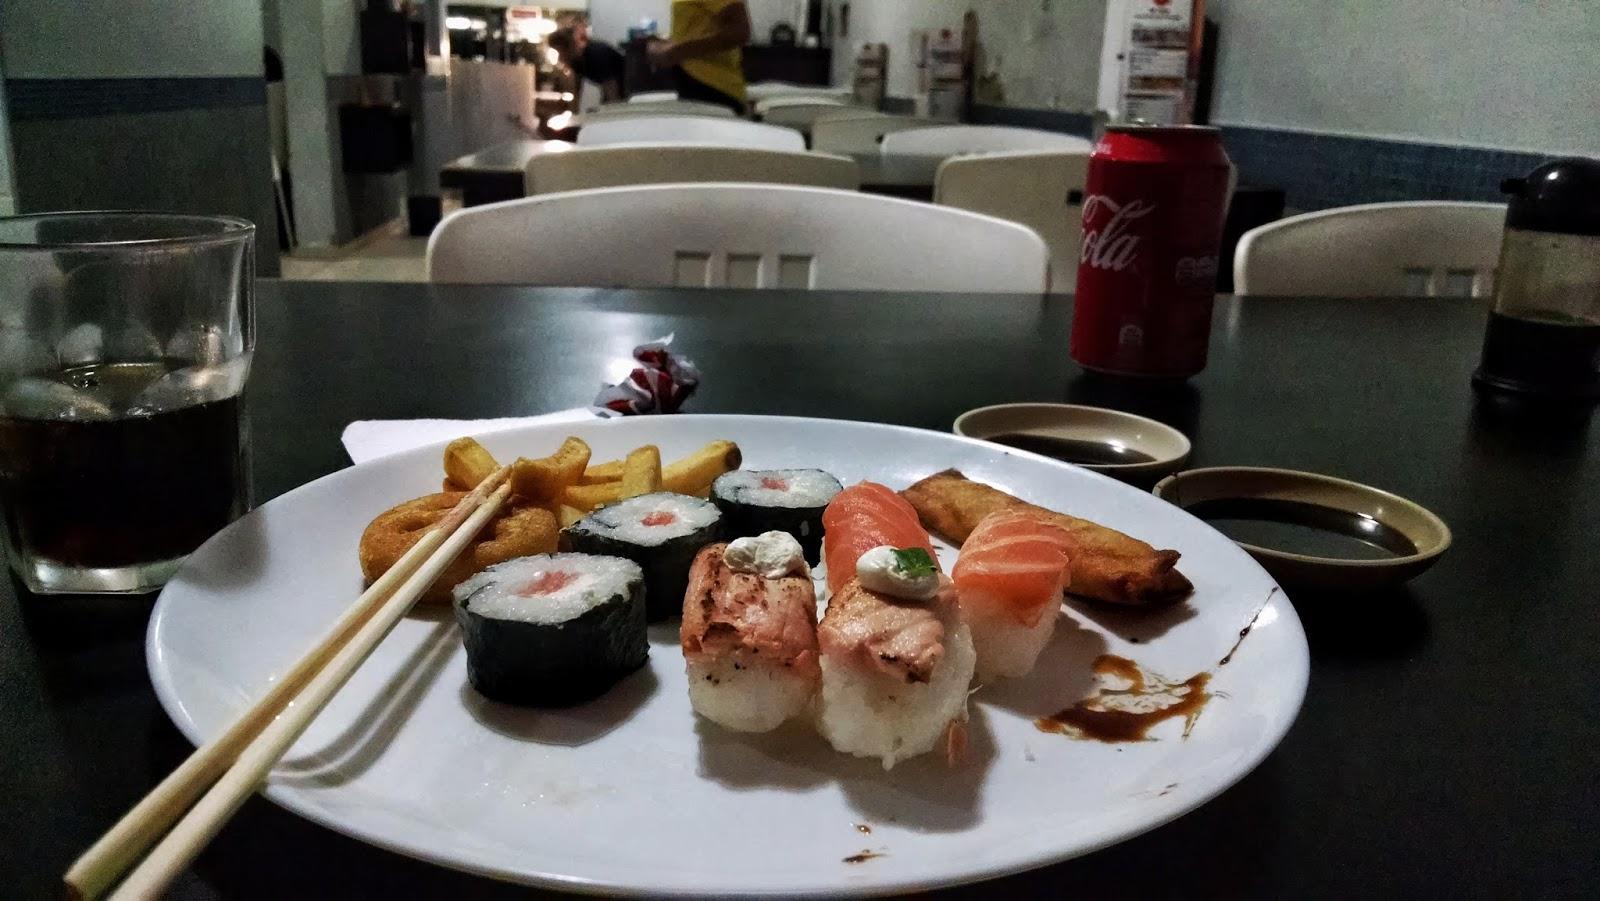 rodizio sushi fortaleza, rodizio fortaleza, rodizio sushi fortaleza, rodizio fortaleza, rodizio sushi fortaleza, rodizio fortaleza,